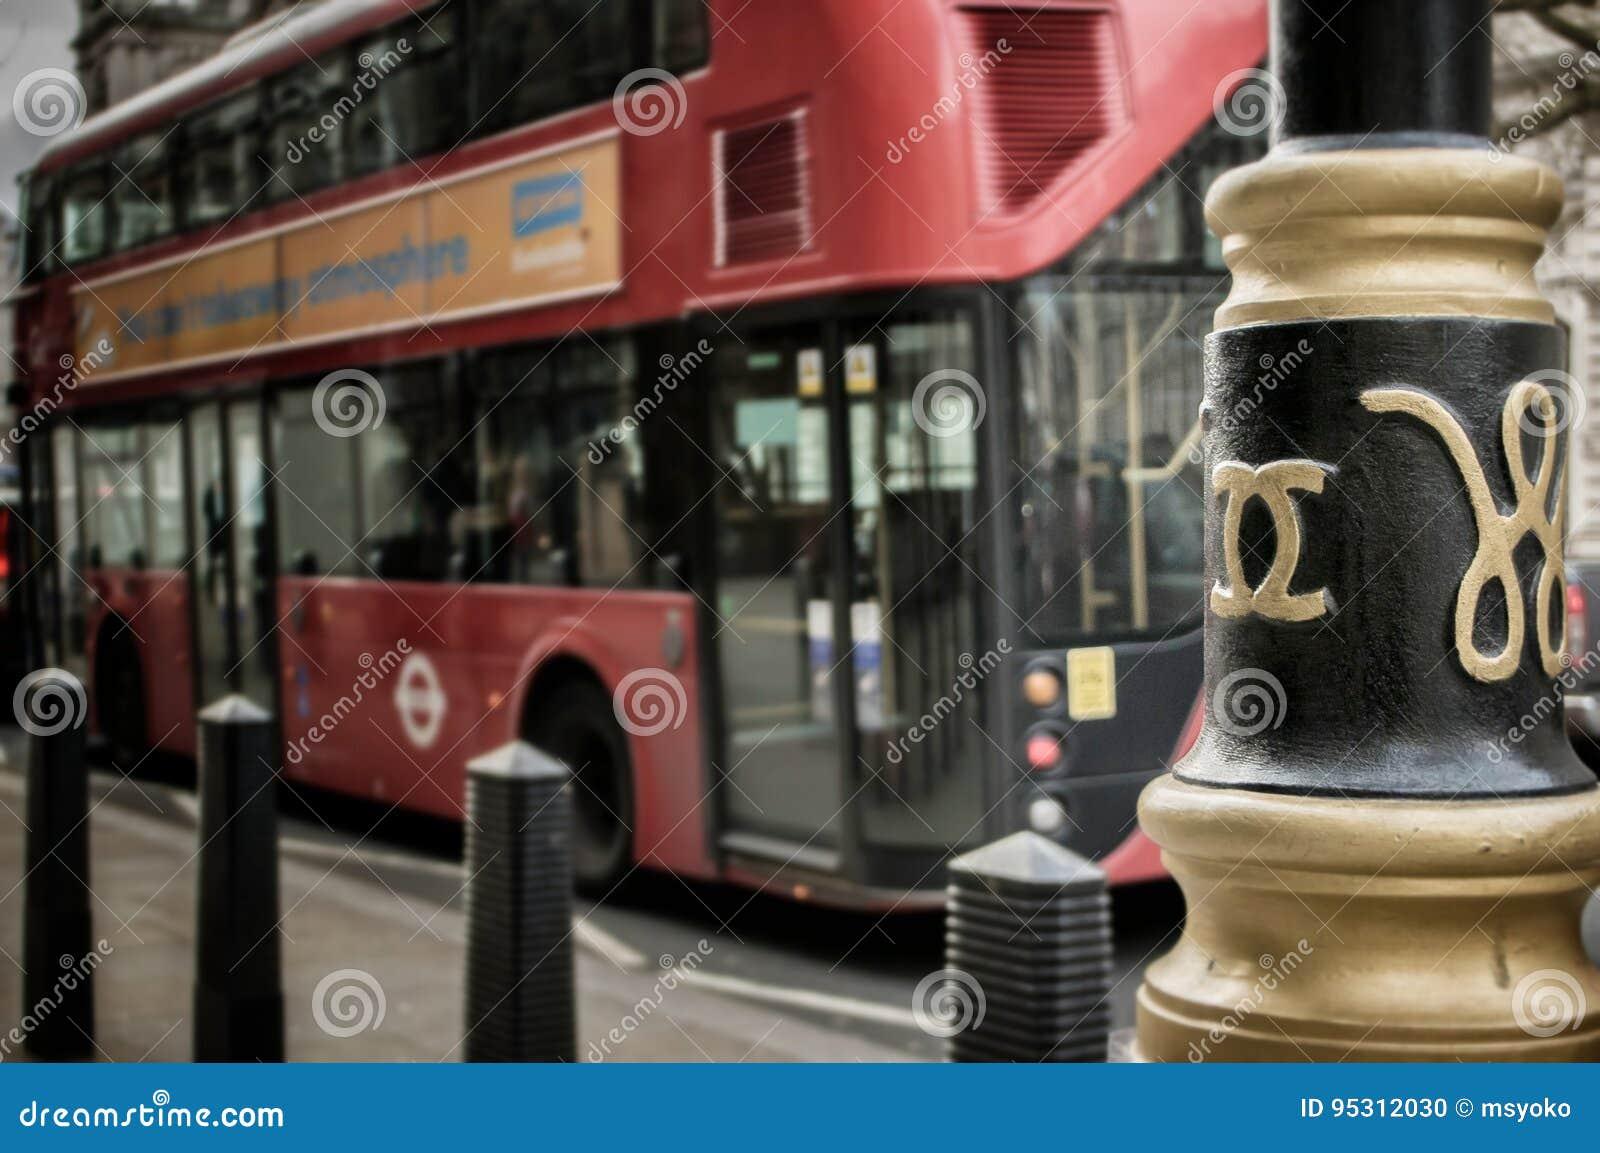 London bus, chanel lamps